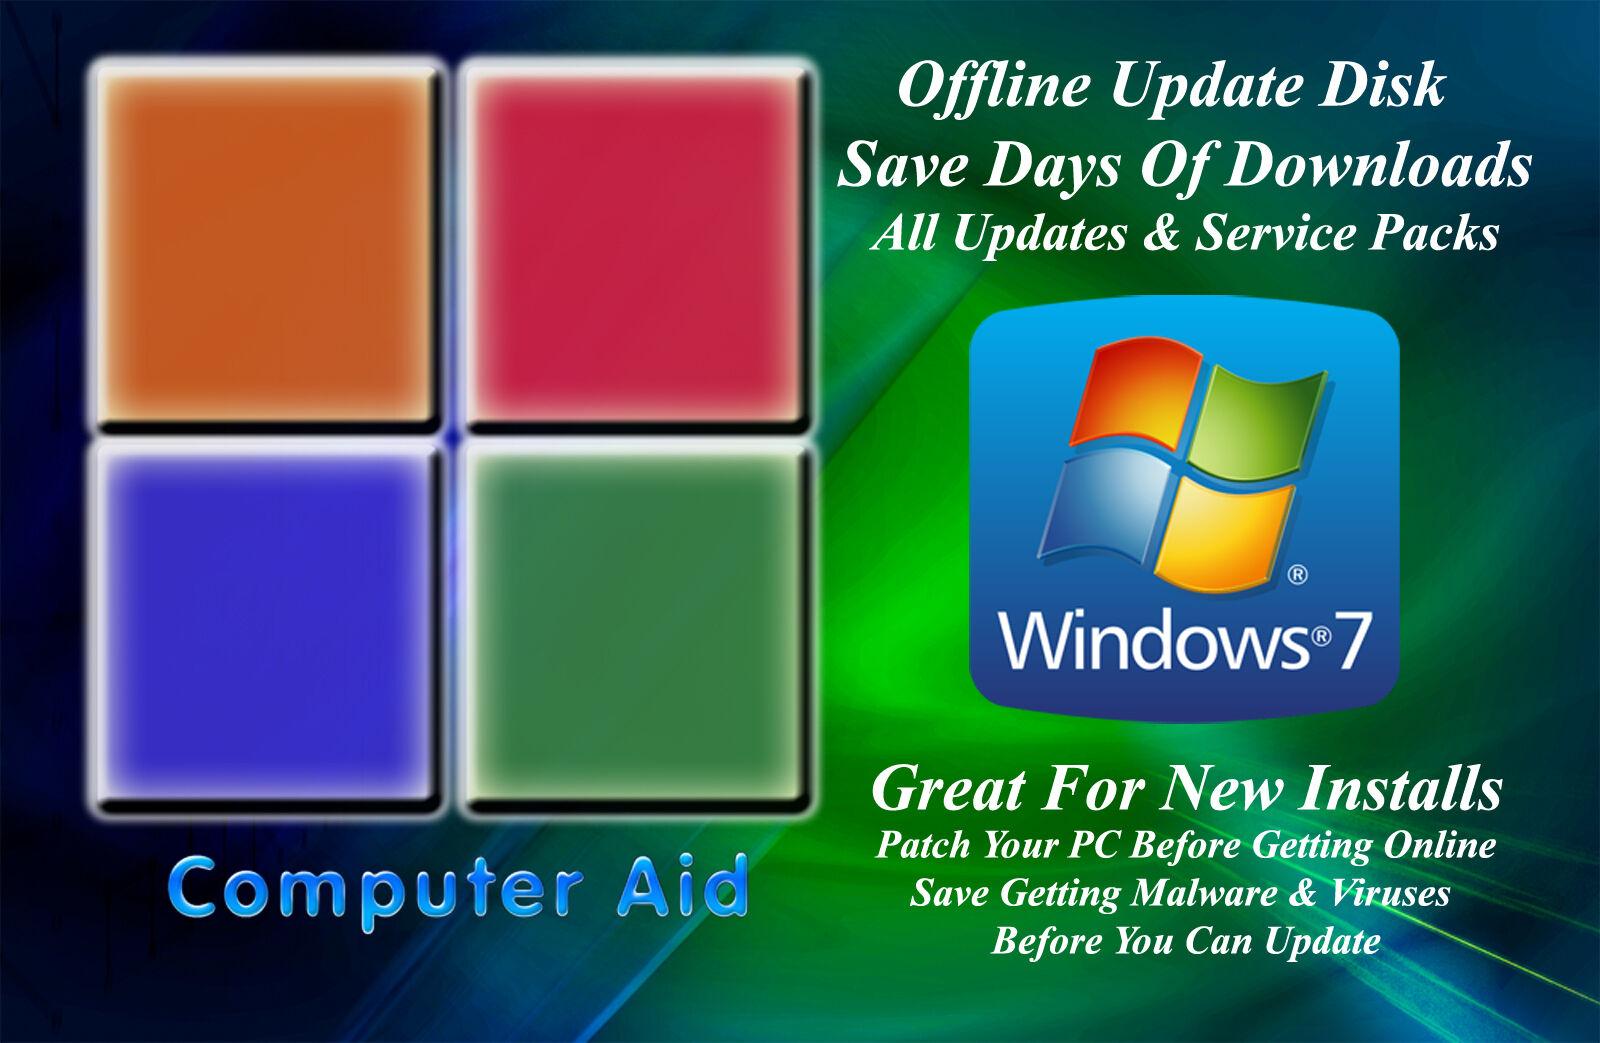 Microsoft Windows Xp, Vista, 7, 8, 8.1 & 10 32 & 64 Bit U...